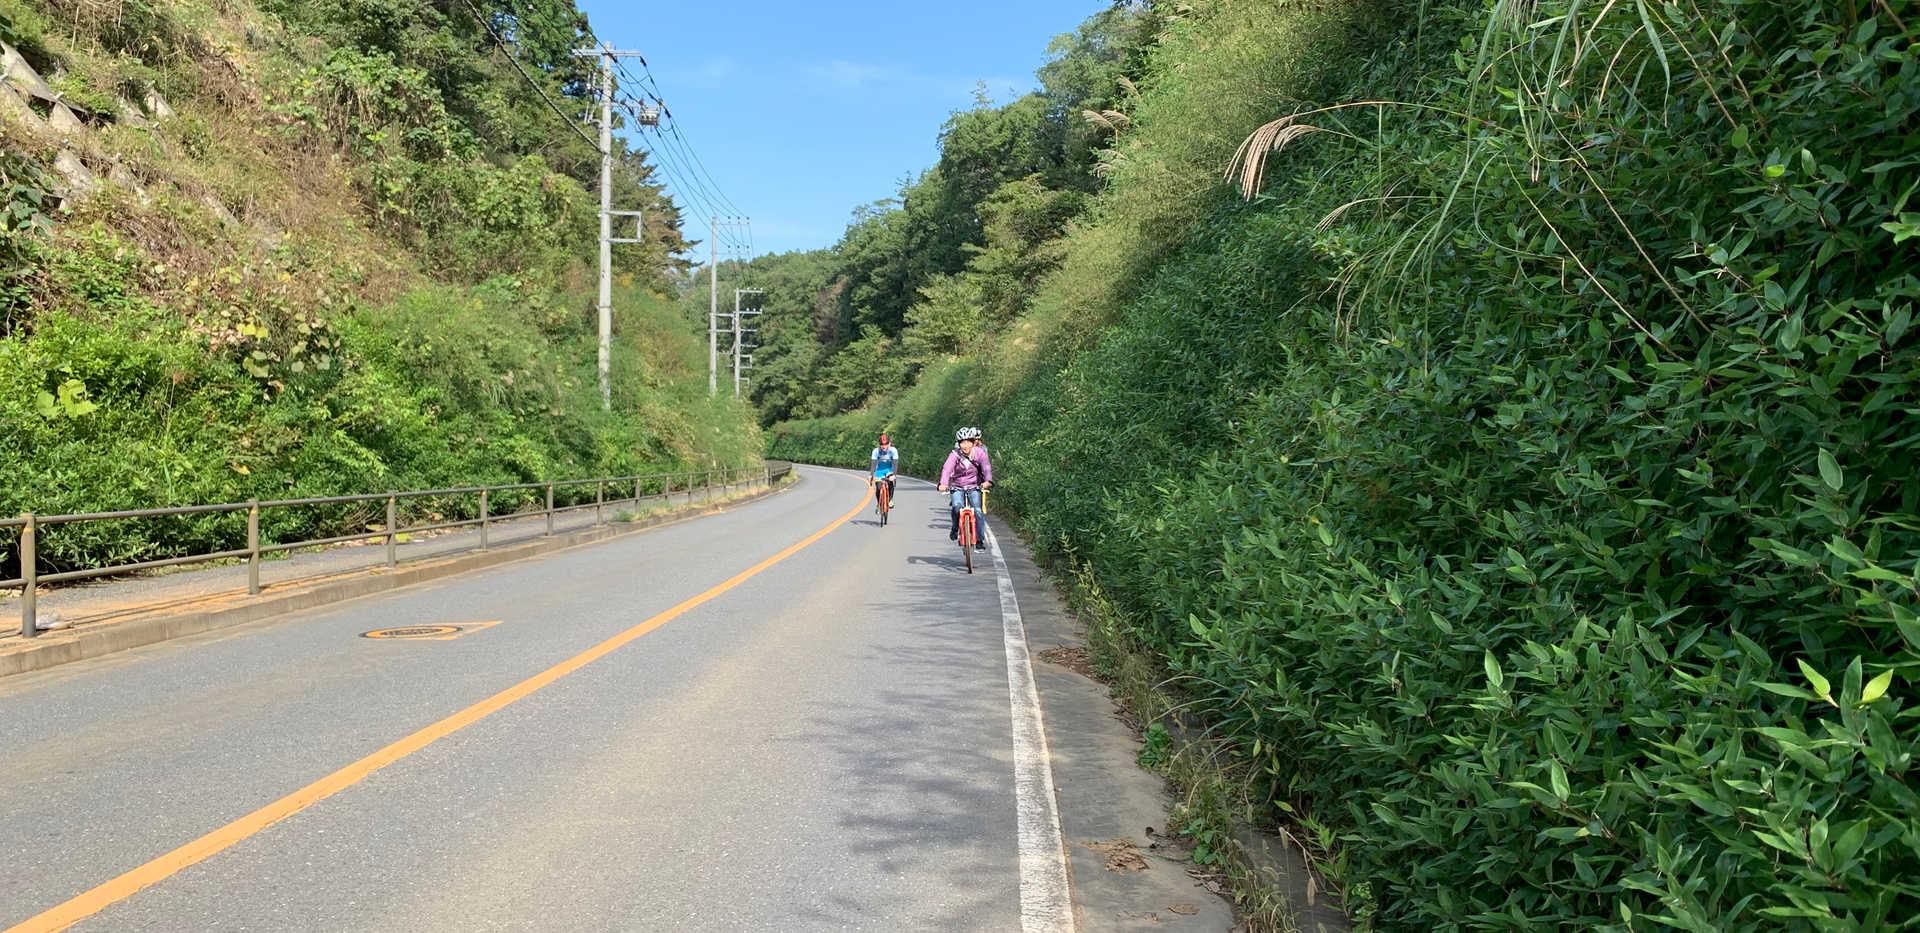 Ome_Cycling_01.jpg